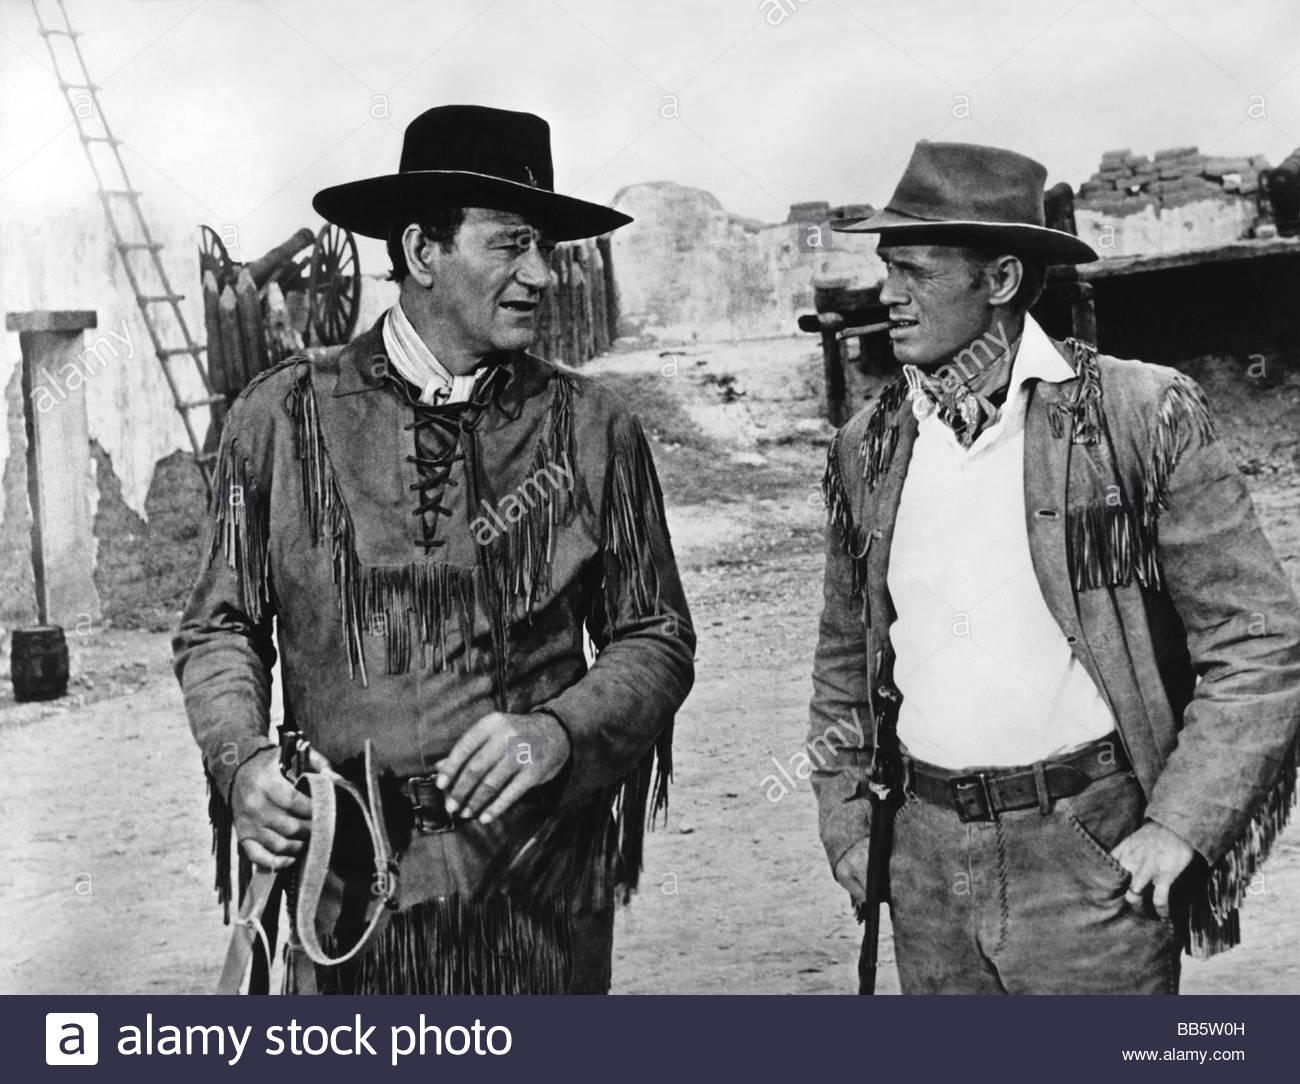 Richard Widmark and john wayne